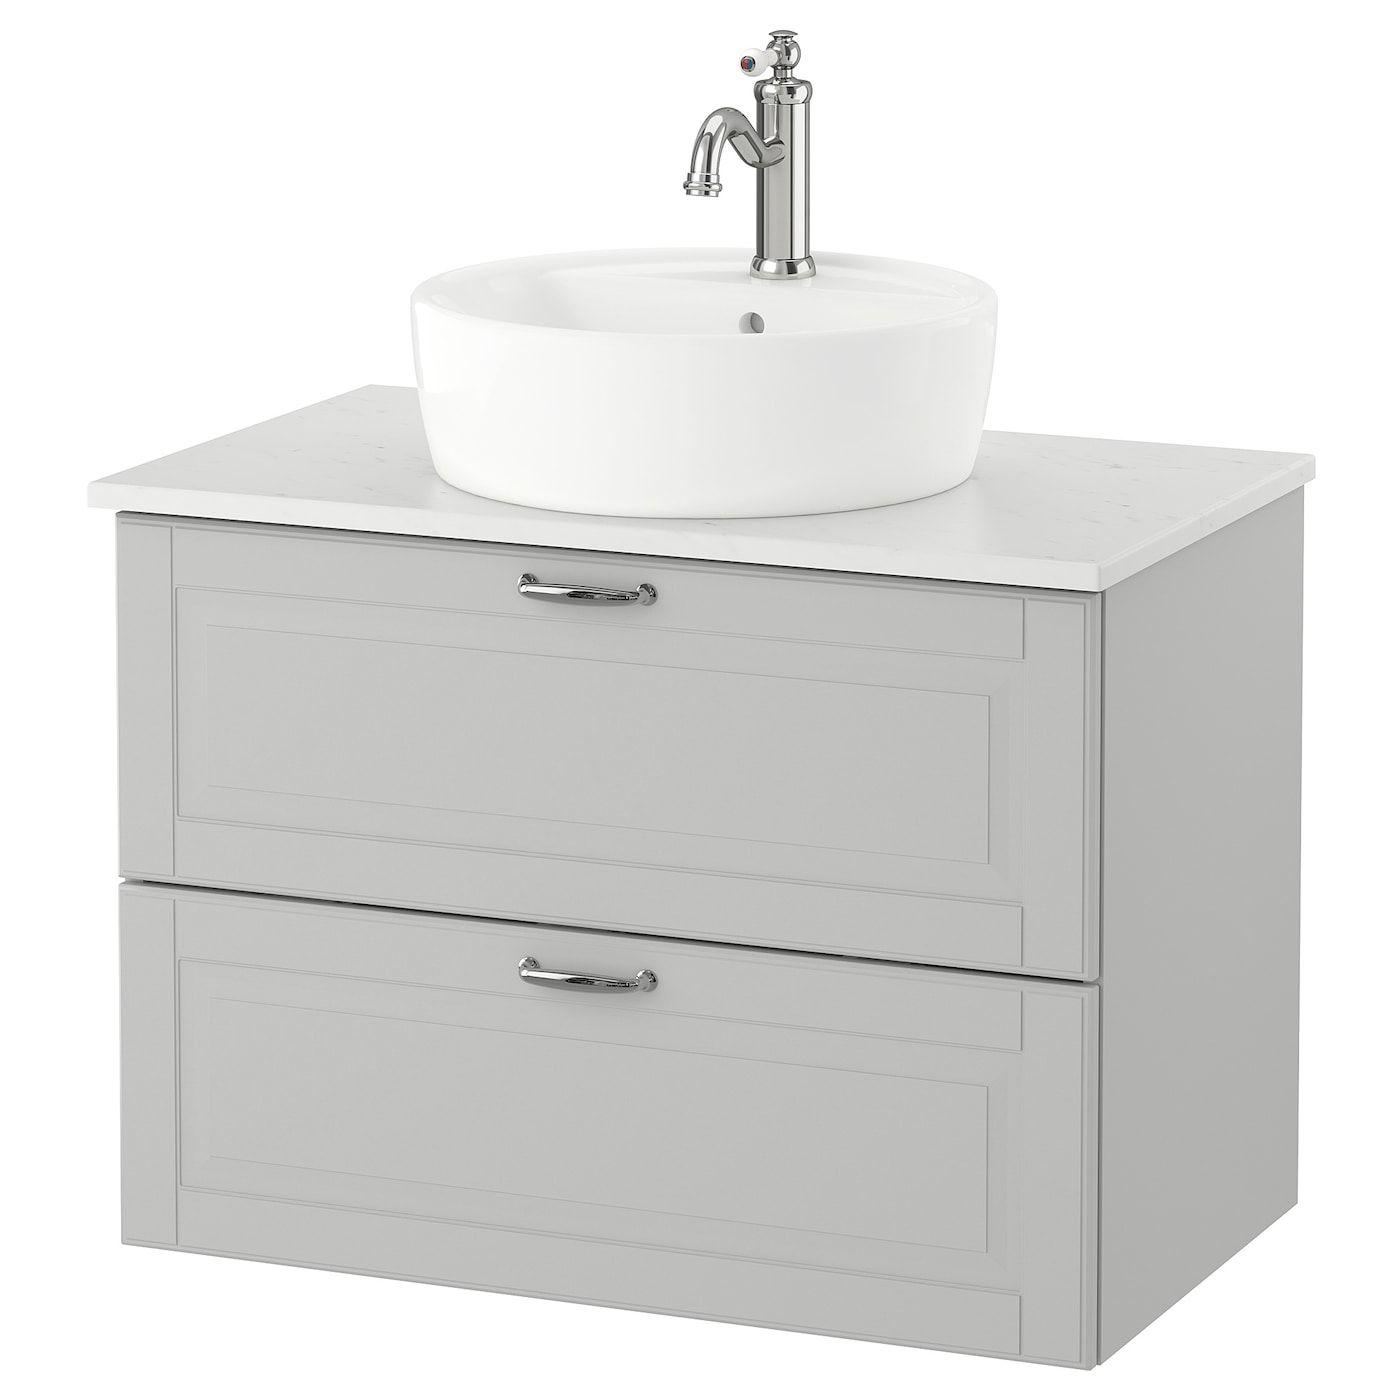 Godmorgon Tolken Tornviken Cabinet Countertop 19 5 8 Sink Kasjon Light Gray Marble Effect Hamnskar Faucet 32 1 4x19 1 4x29 1 8 Ikea In 2020 Ikea Godmorgon Bathroom Vanity Sink Cabinet